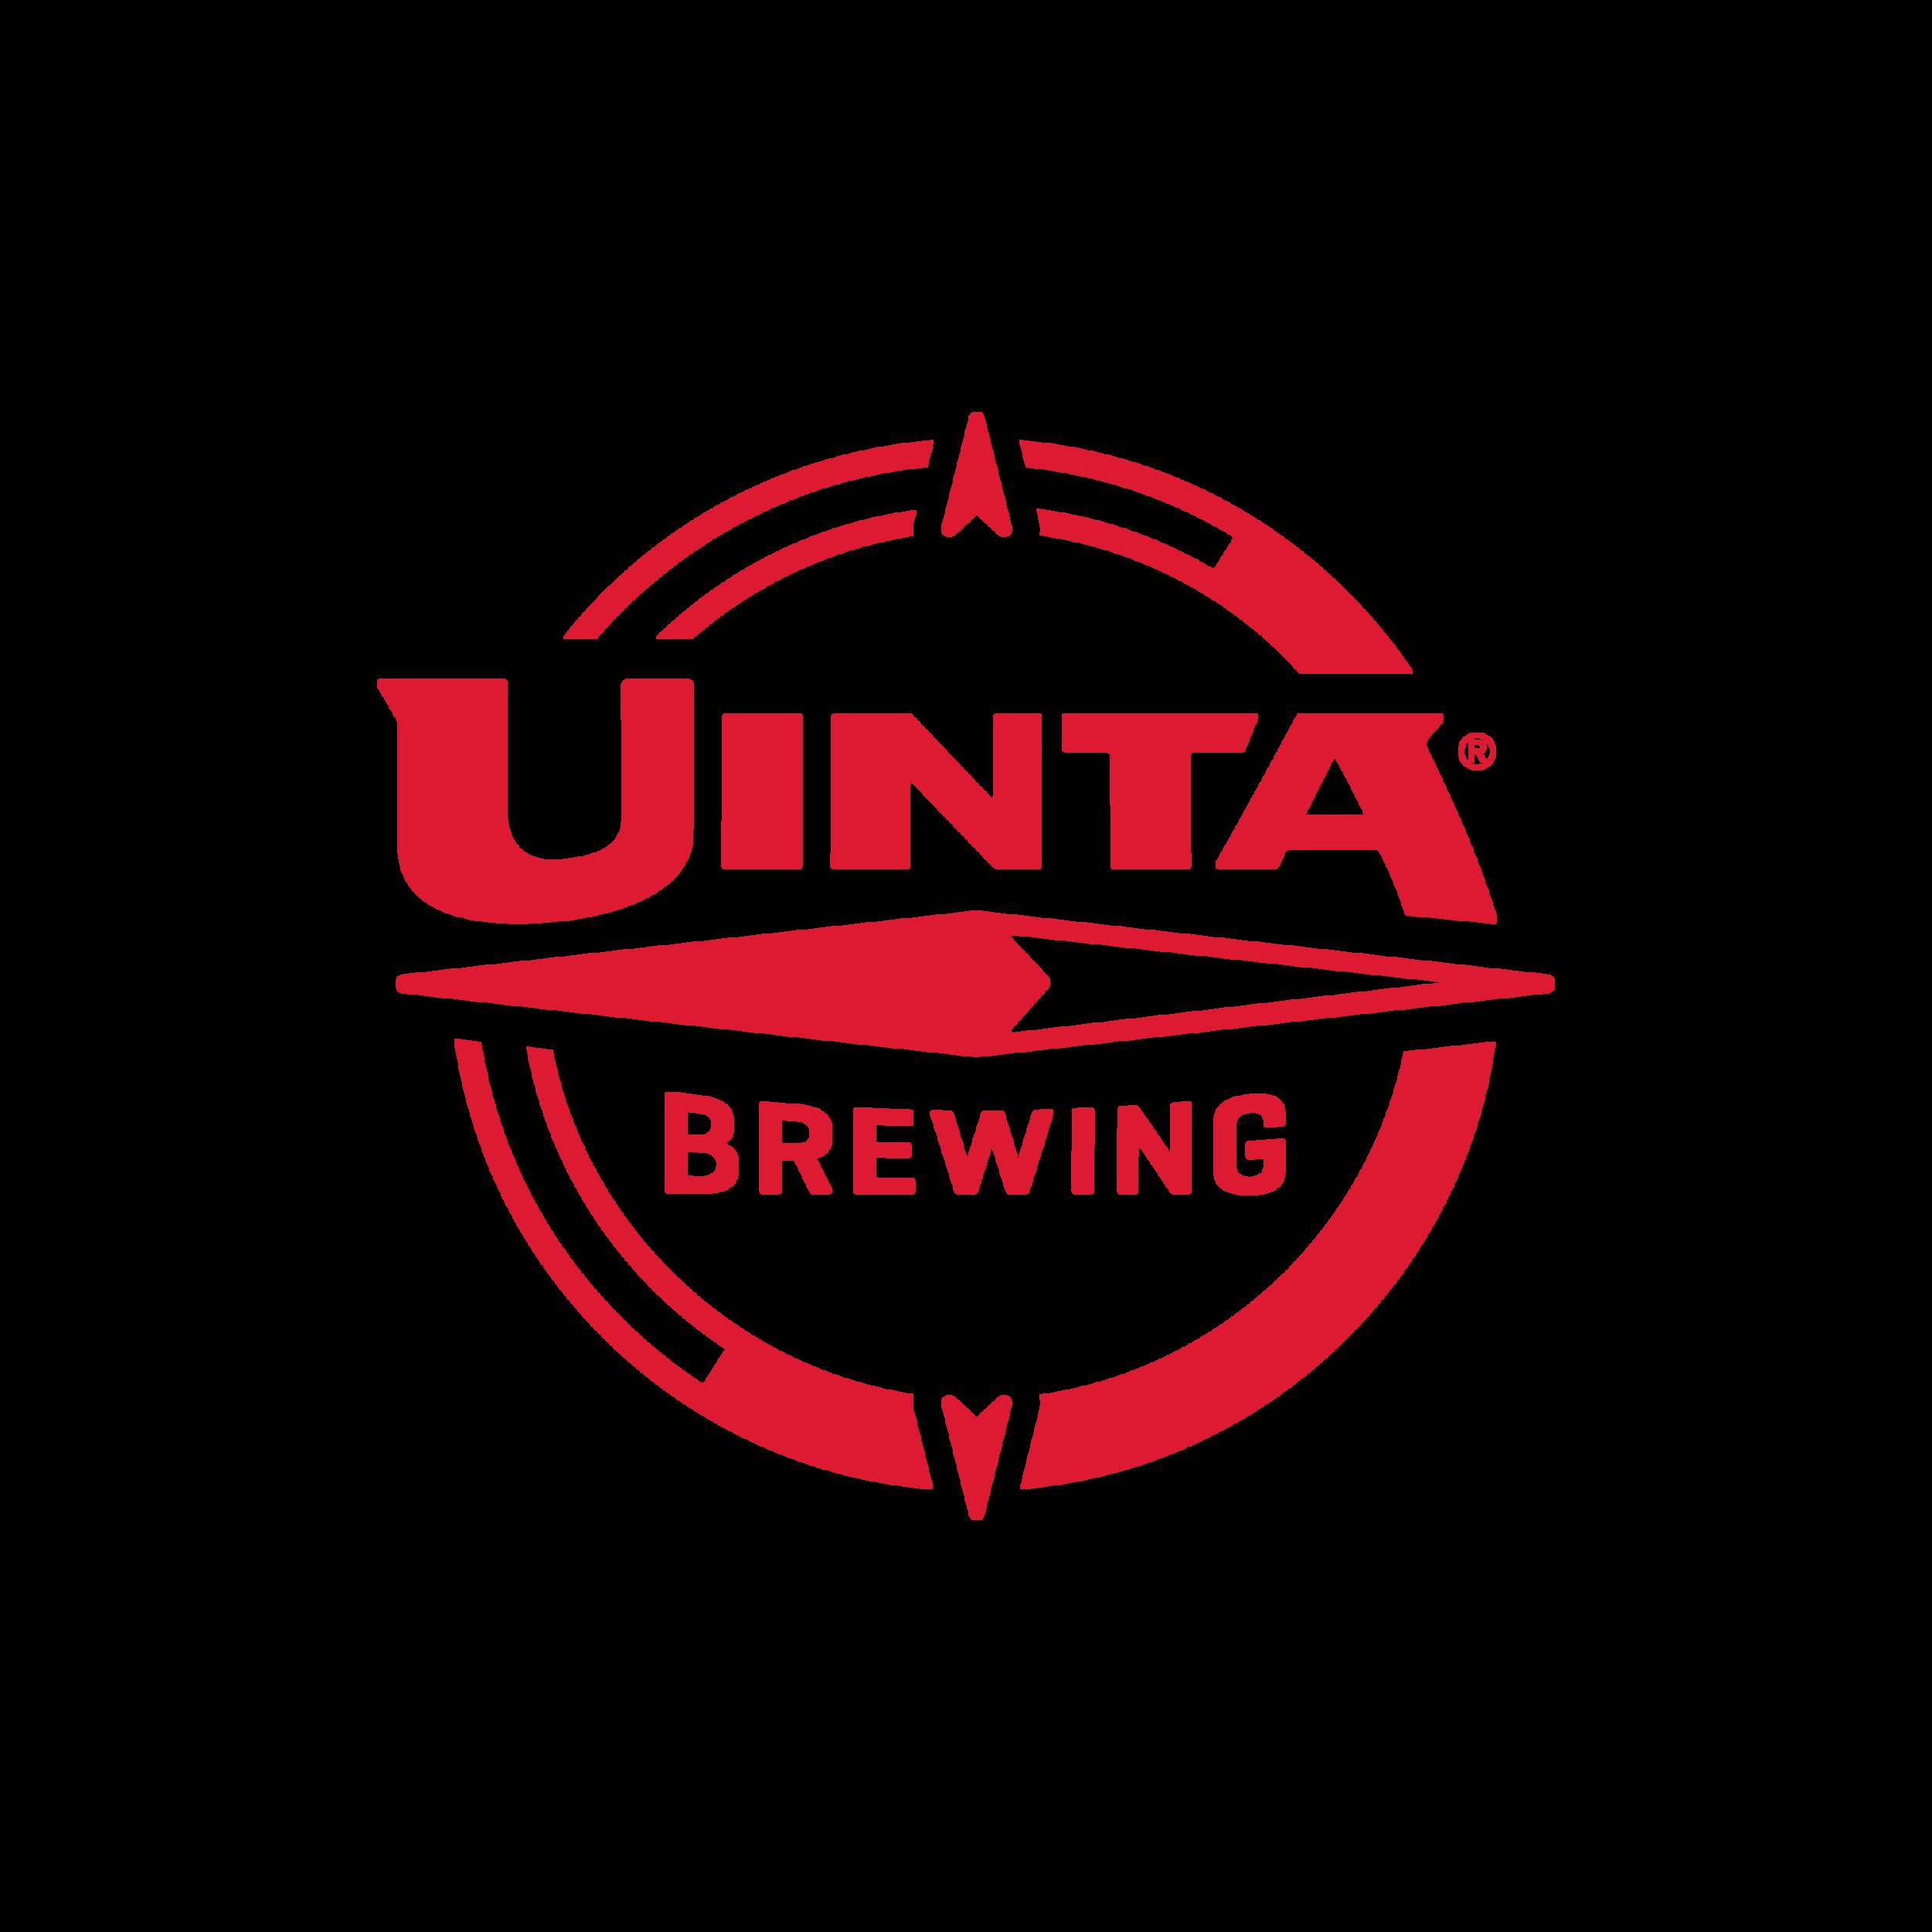 Uinta-01.png